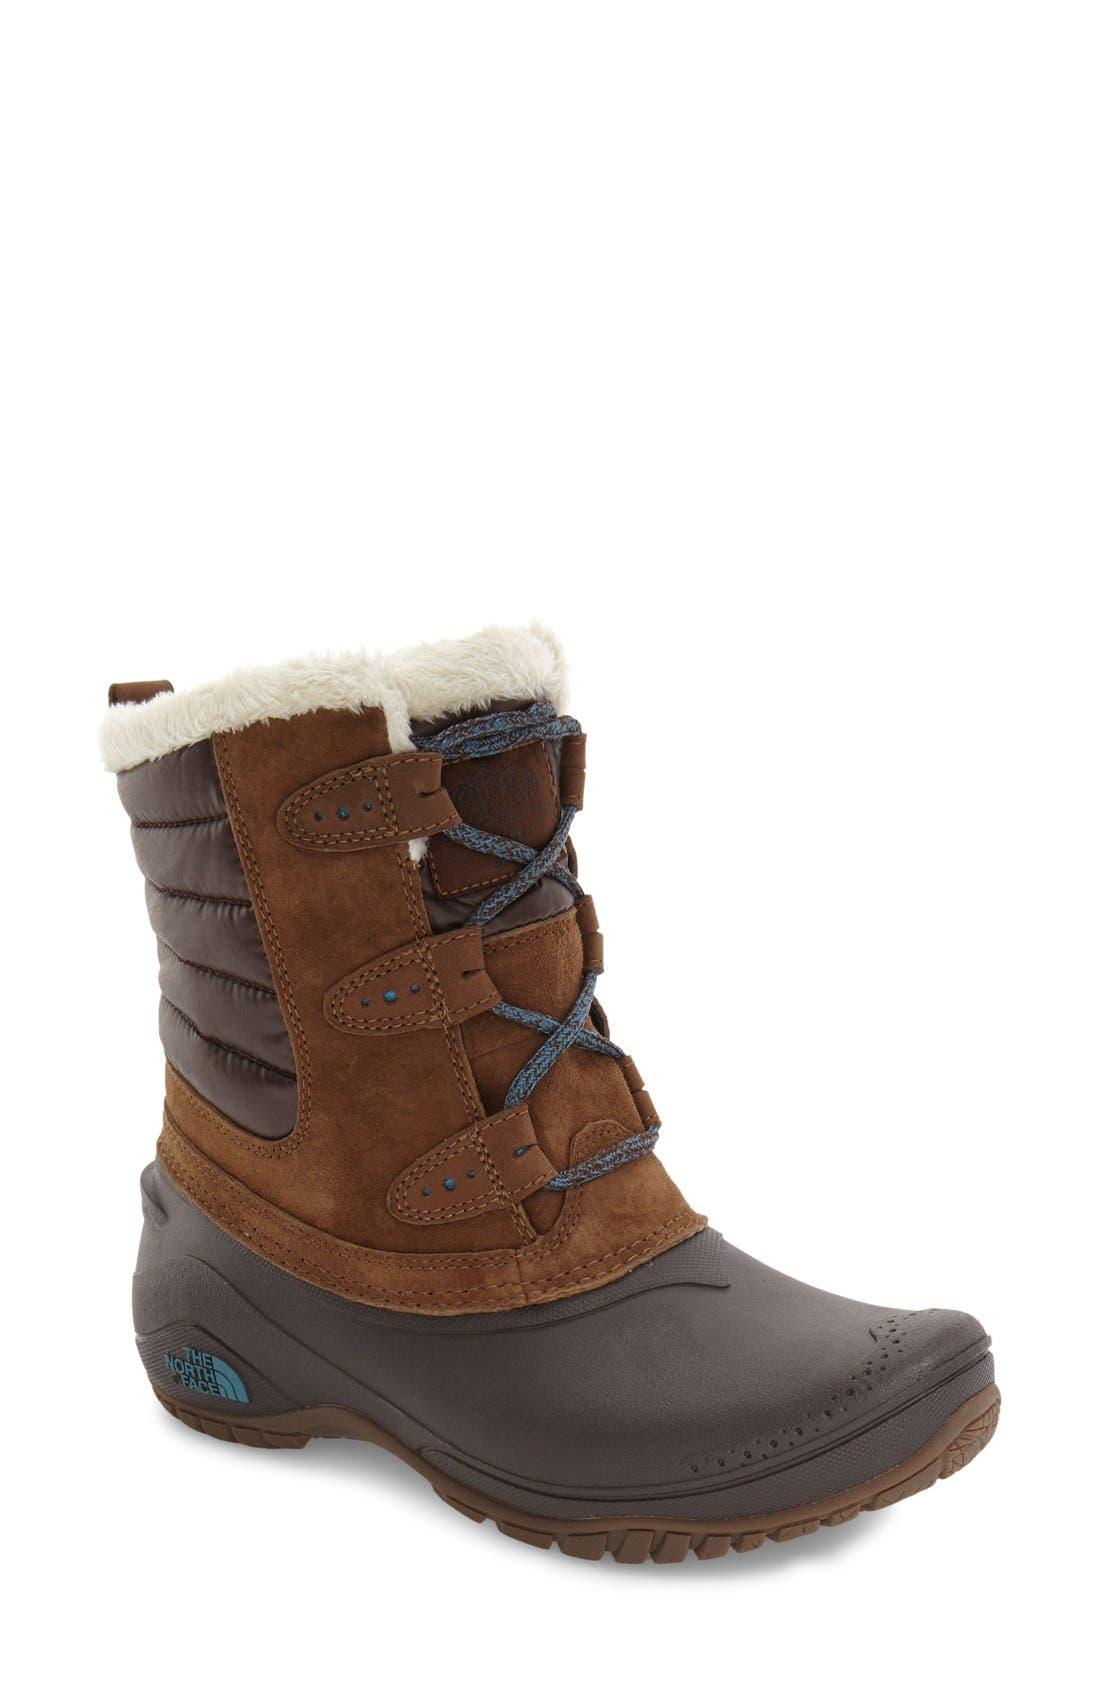 Main Image - The North Face Shellista II Waterproof Boot (Women)